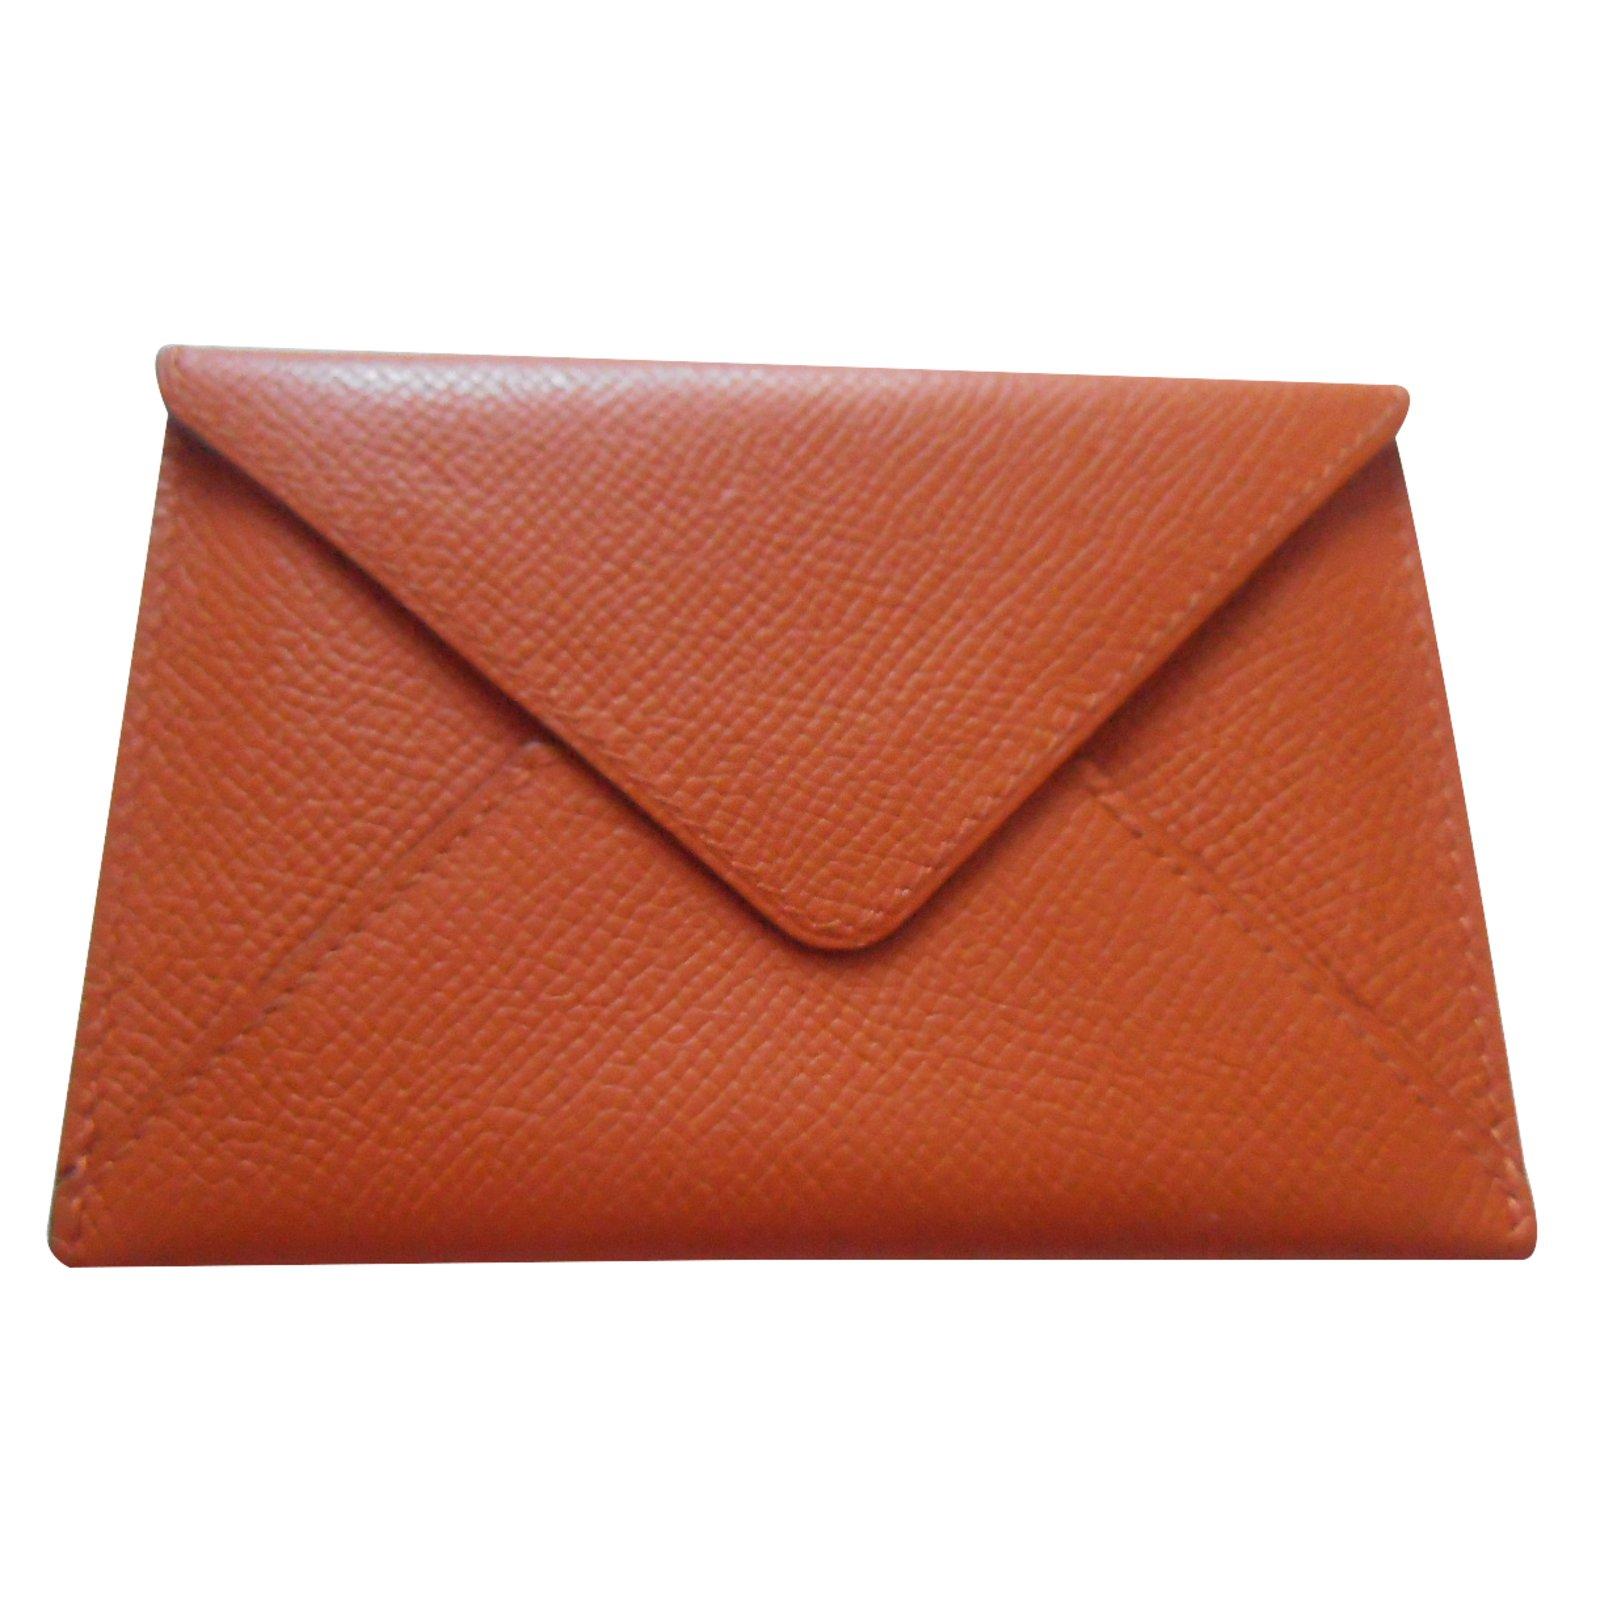 c8d472ef18 Petite maroquinerie Hermès porte carte envelopppe Cuir Orange ref.25041